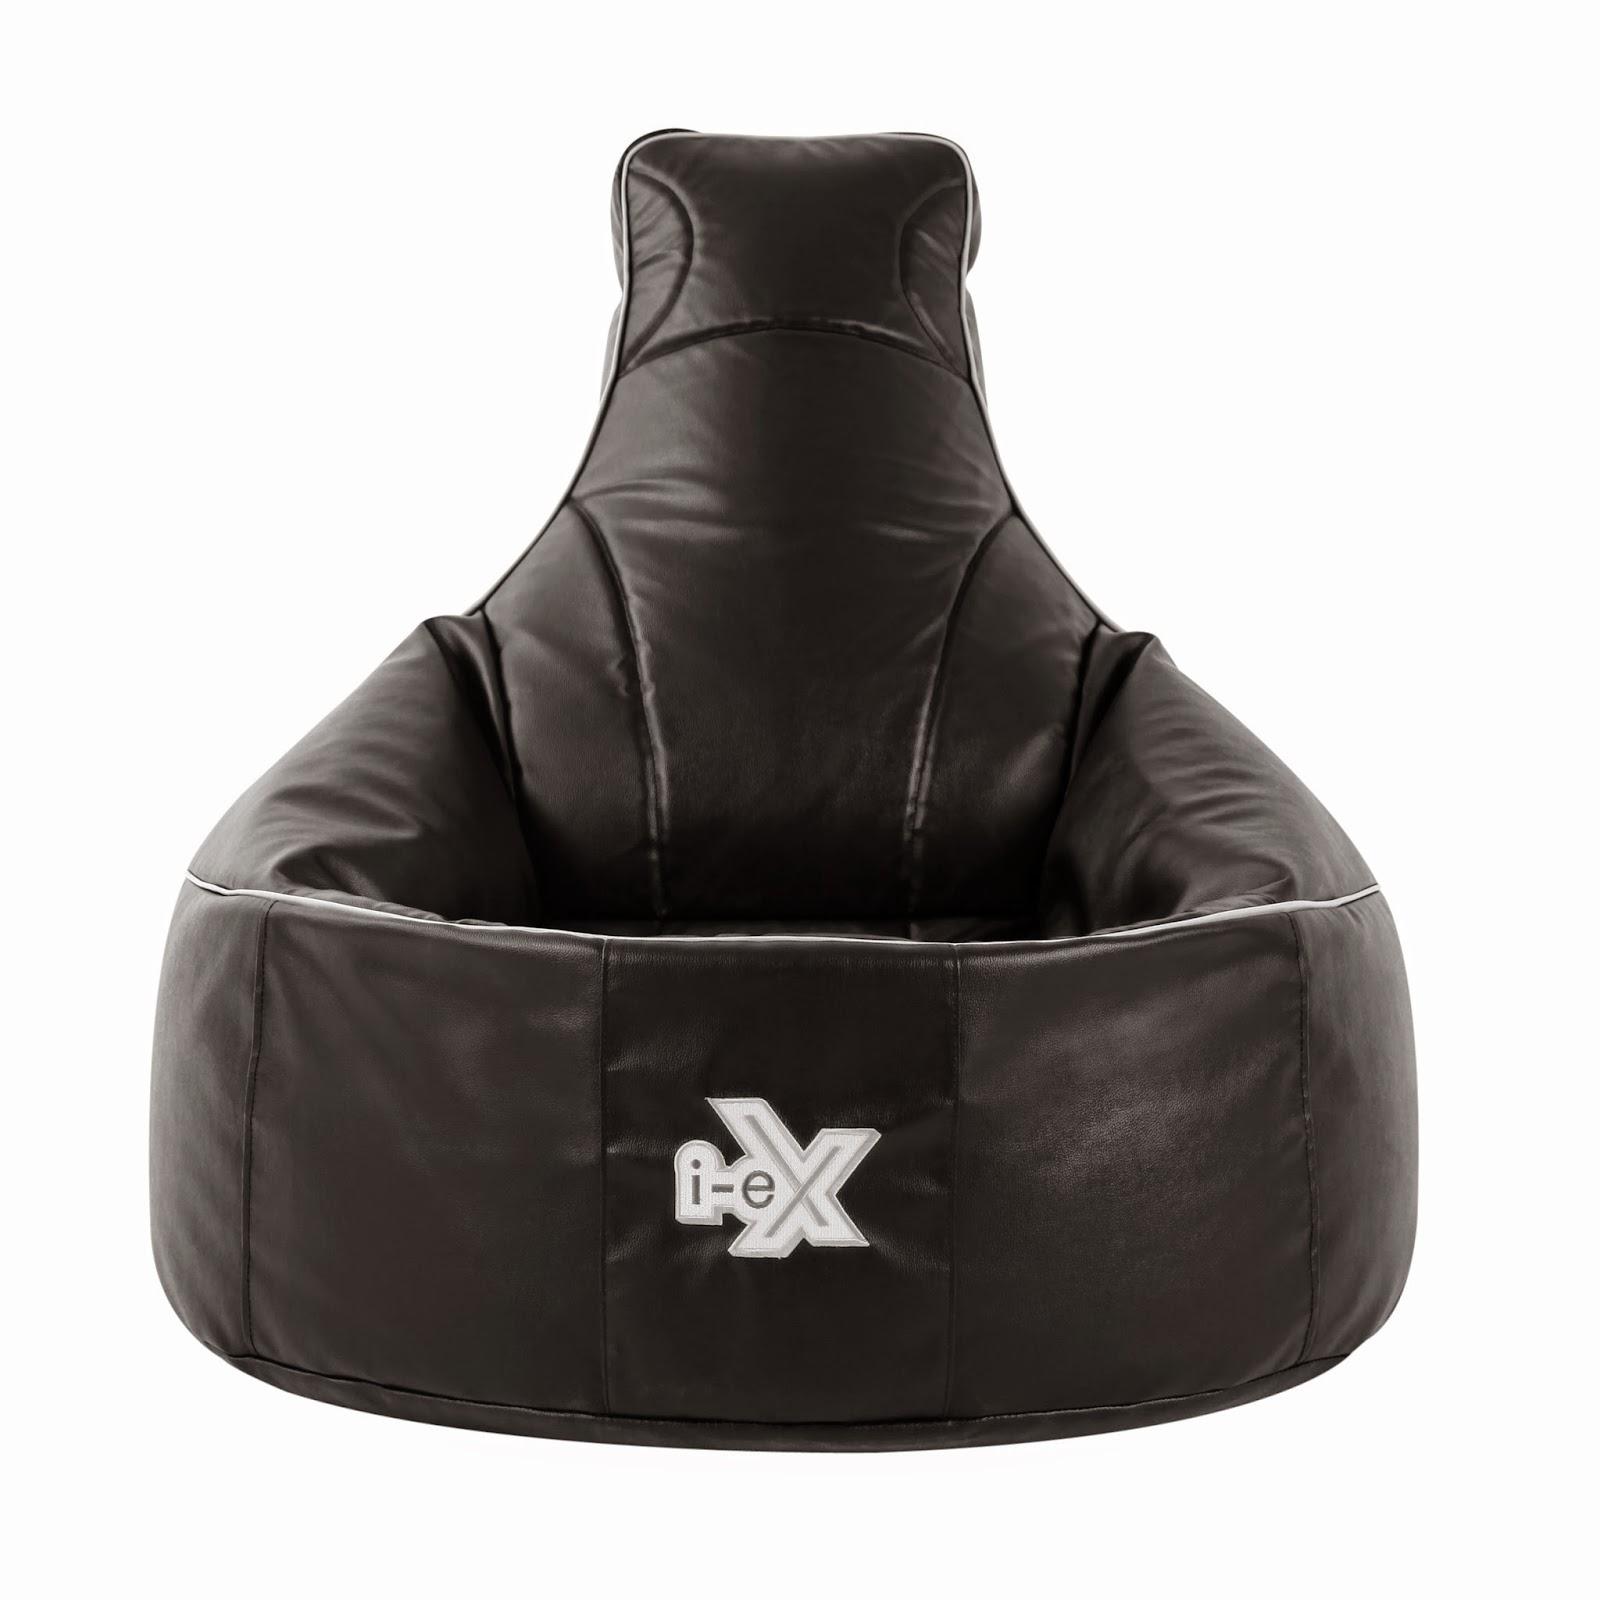 REVIEW i eX Bean Bag Gaming Chair